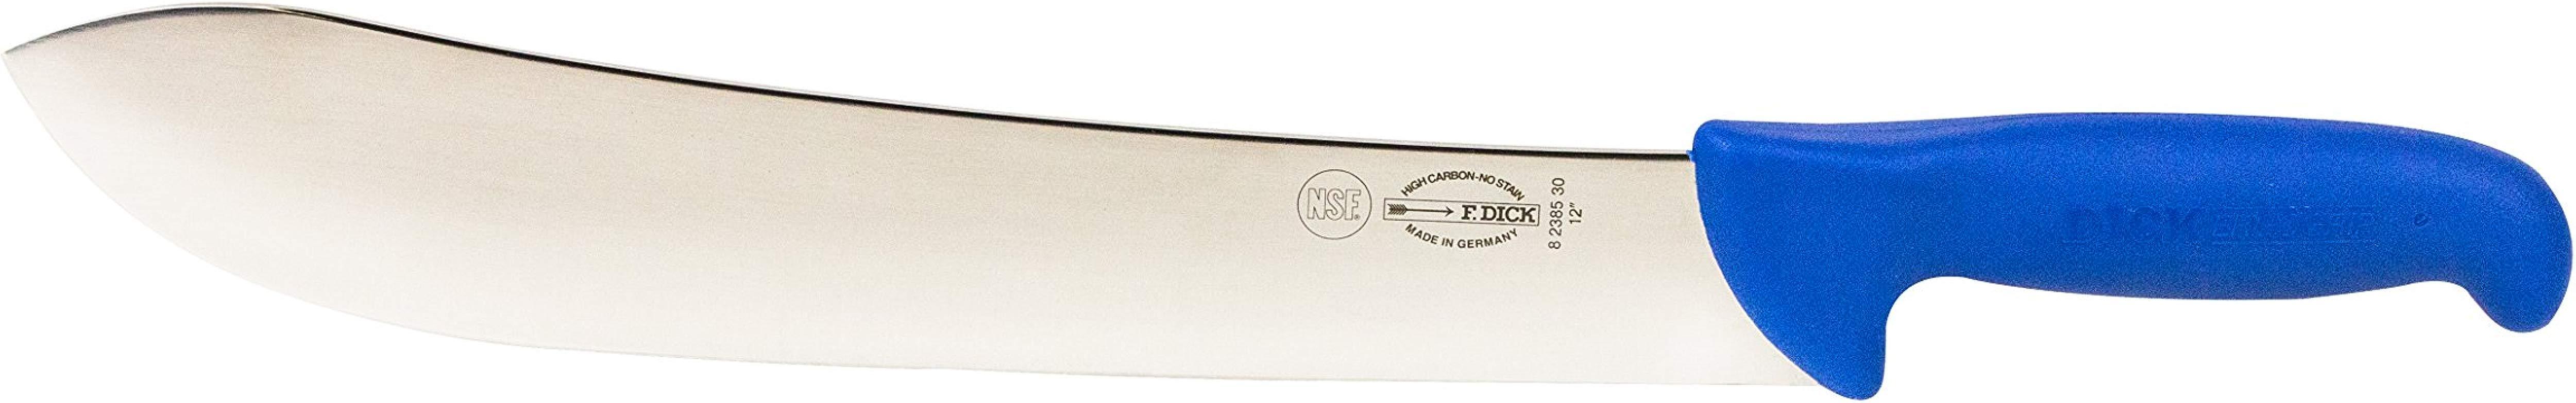 F Dick Butcher Knife 10 Blade ErgoGrip Series